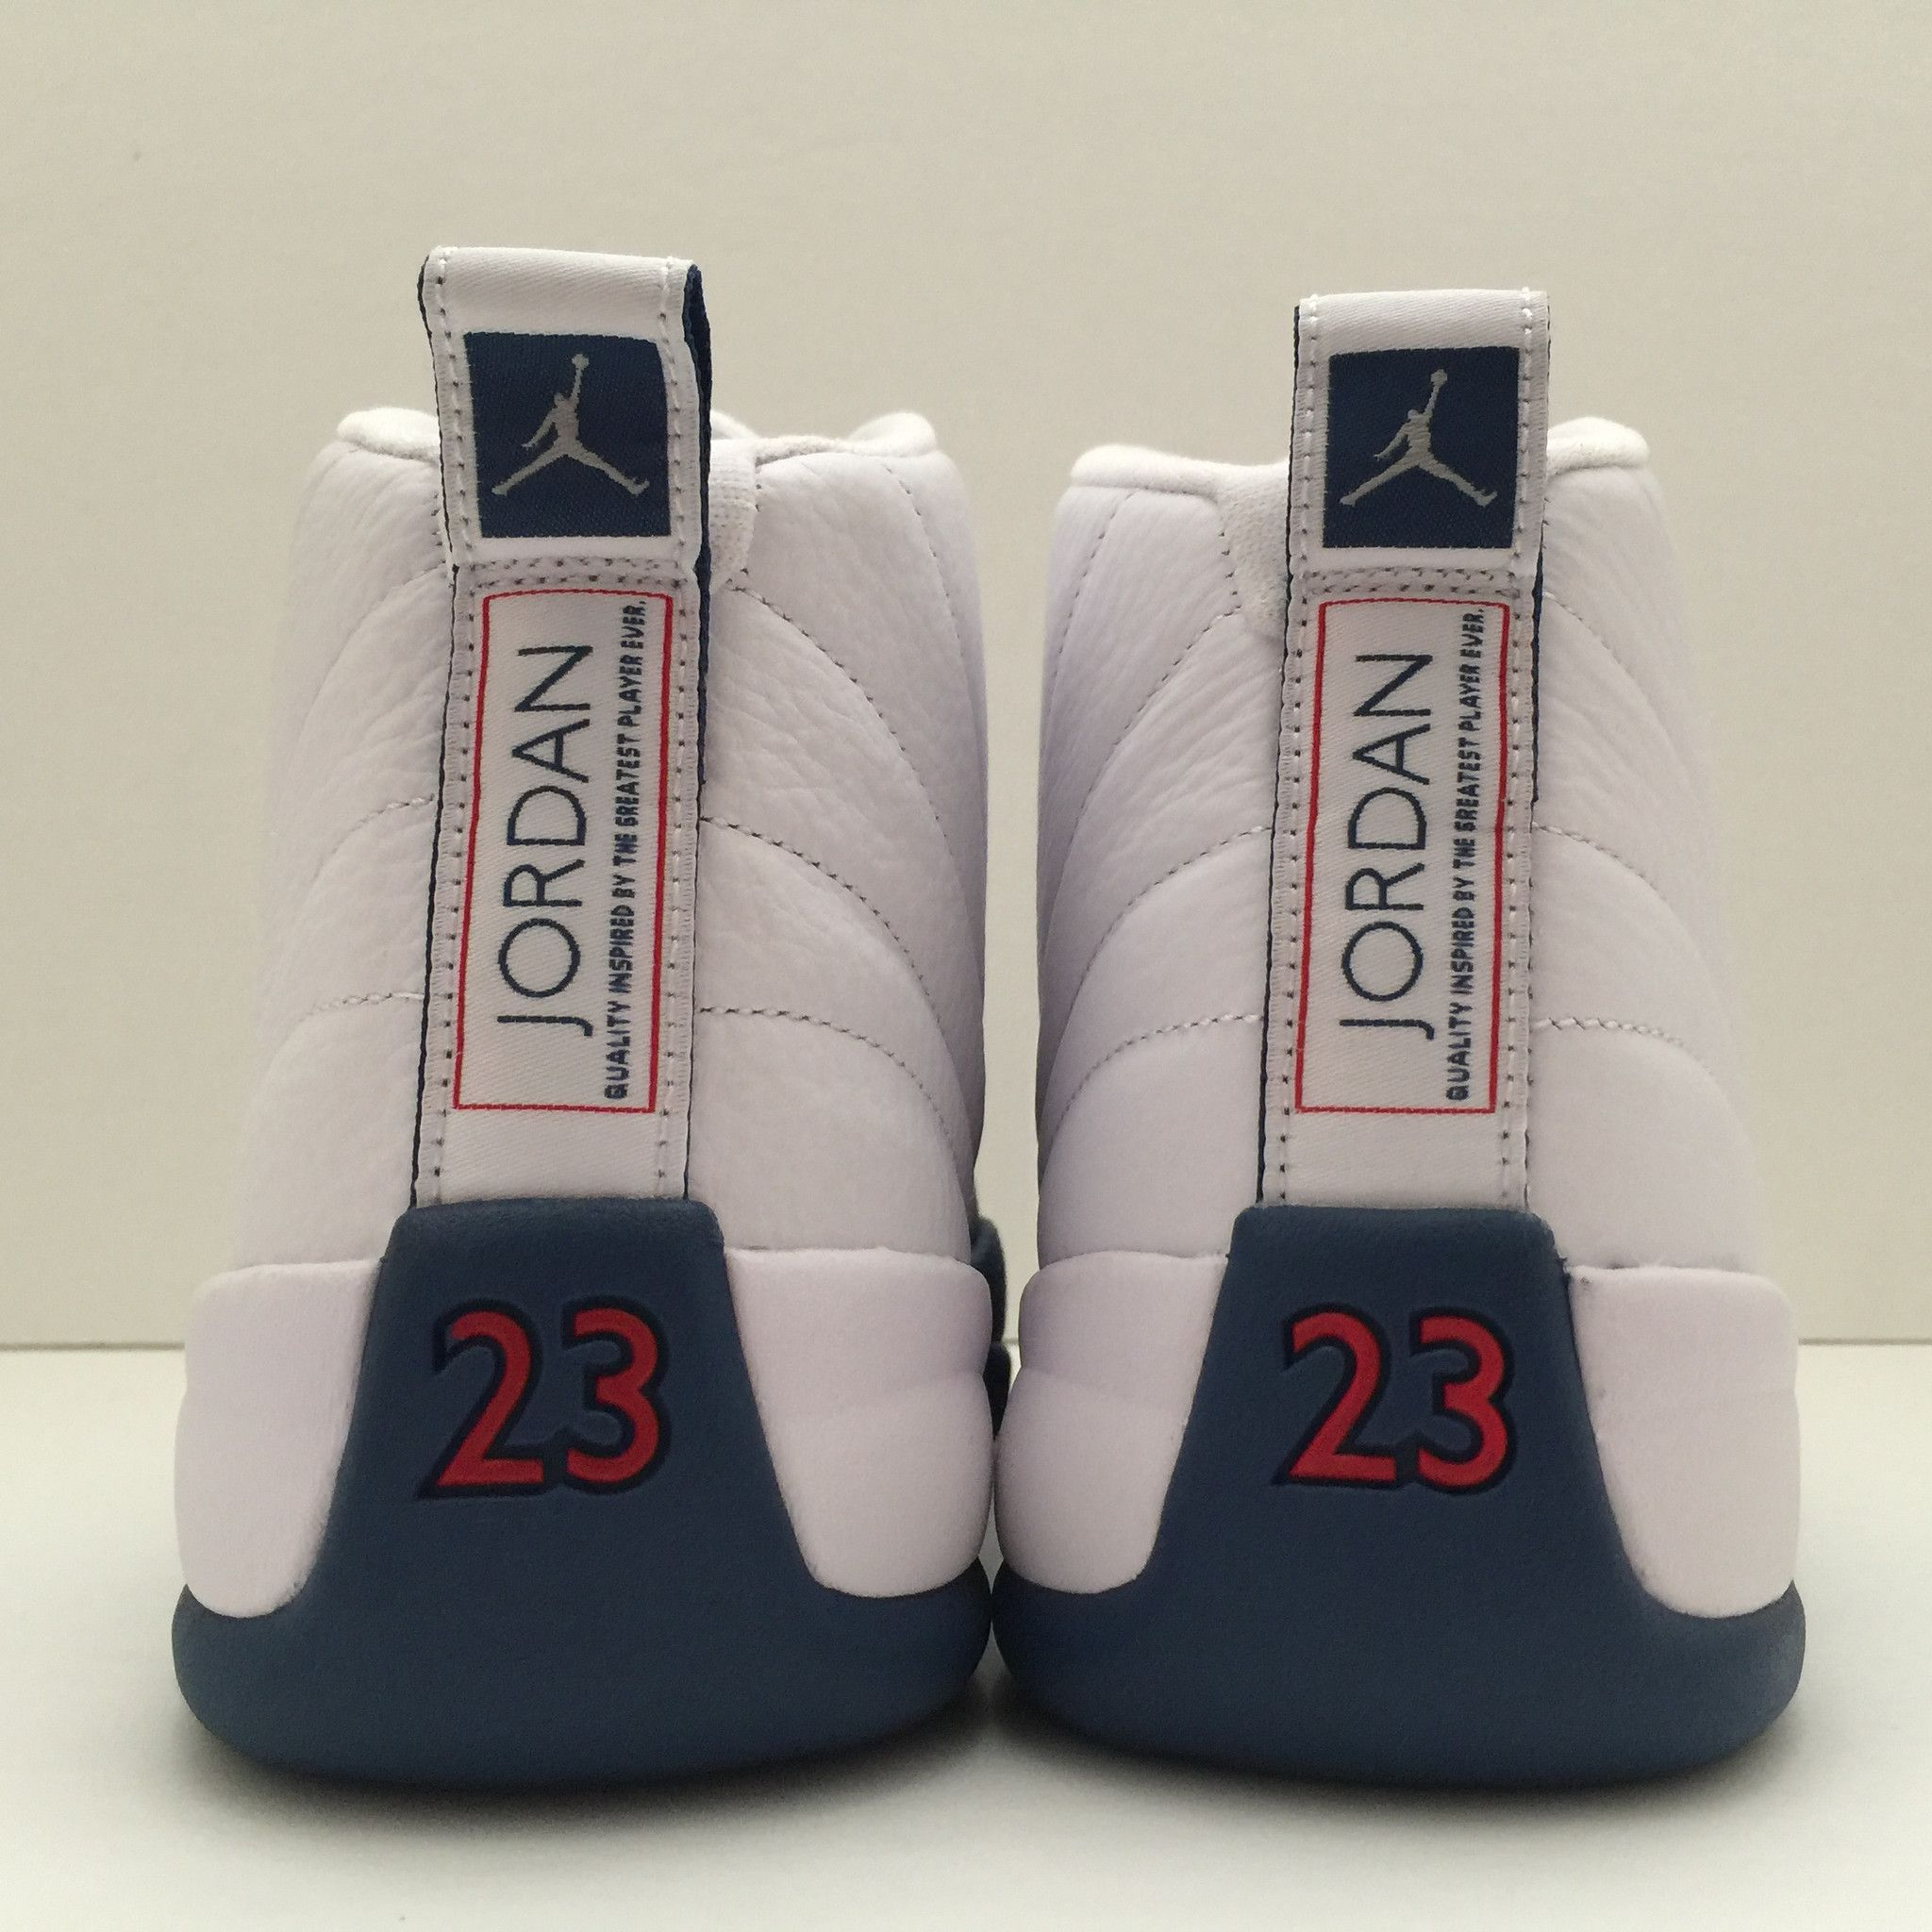 Nike Air Jordan 12 XII Mens Shoes 2013 New Grey